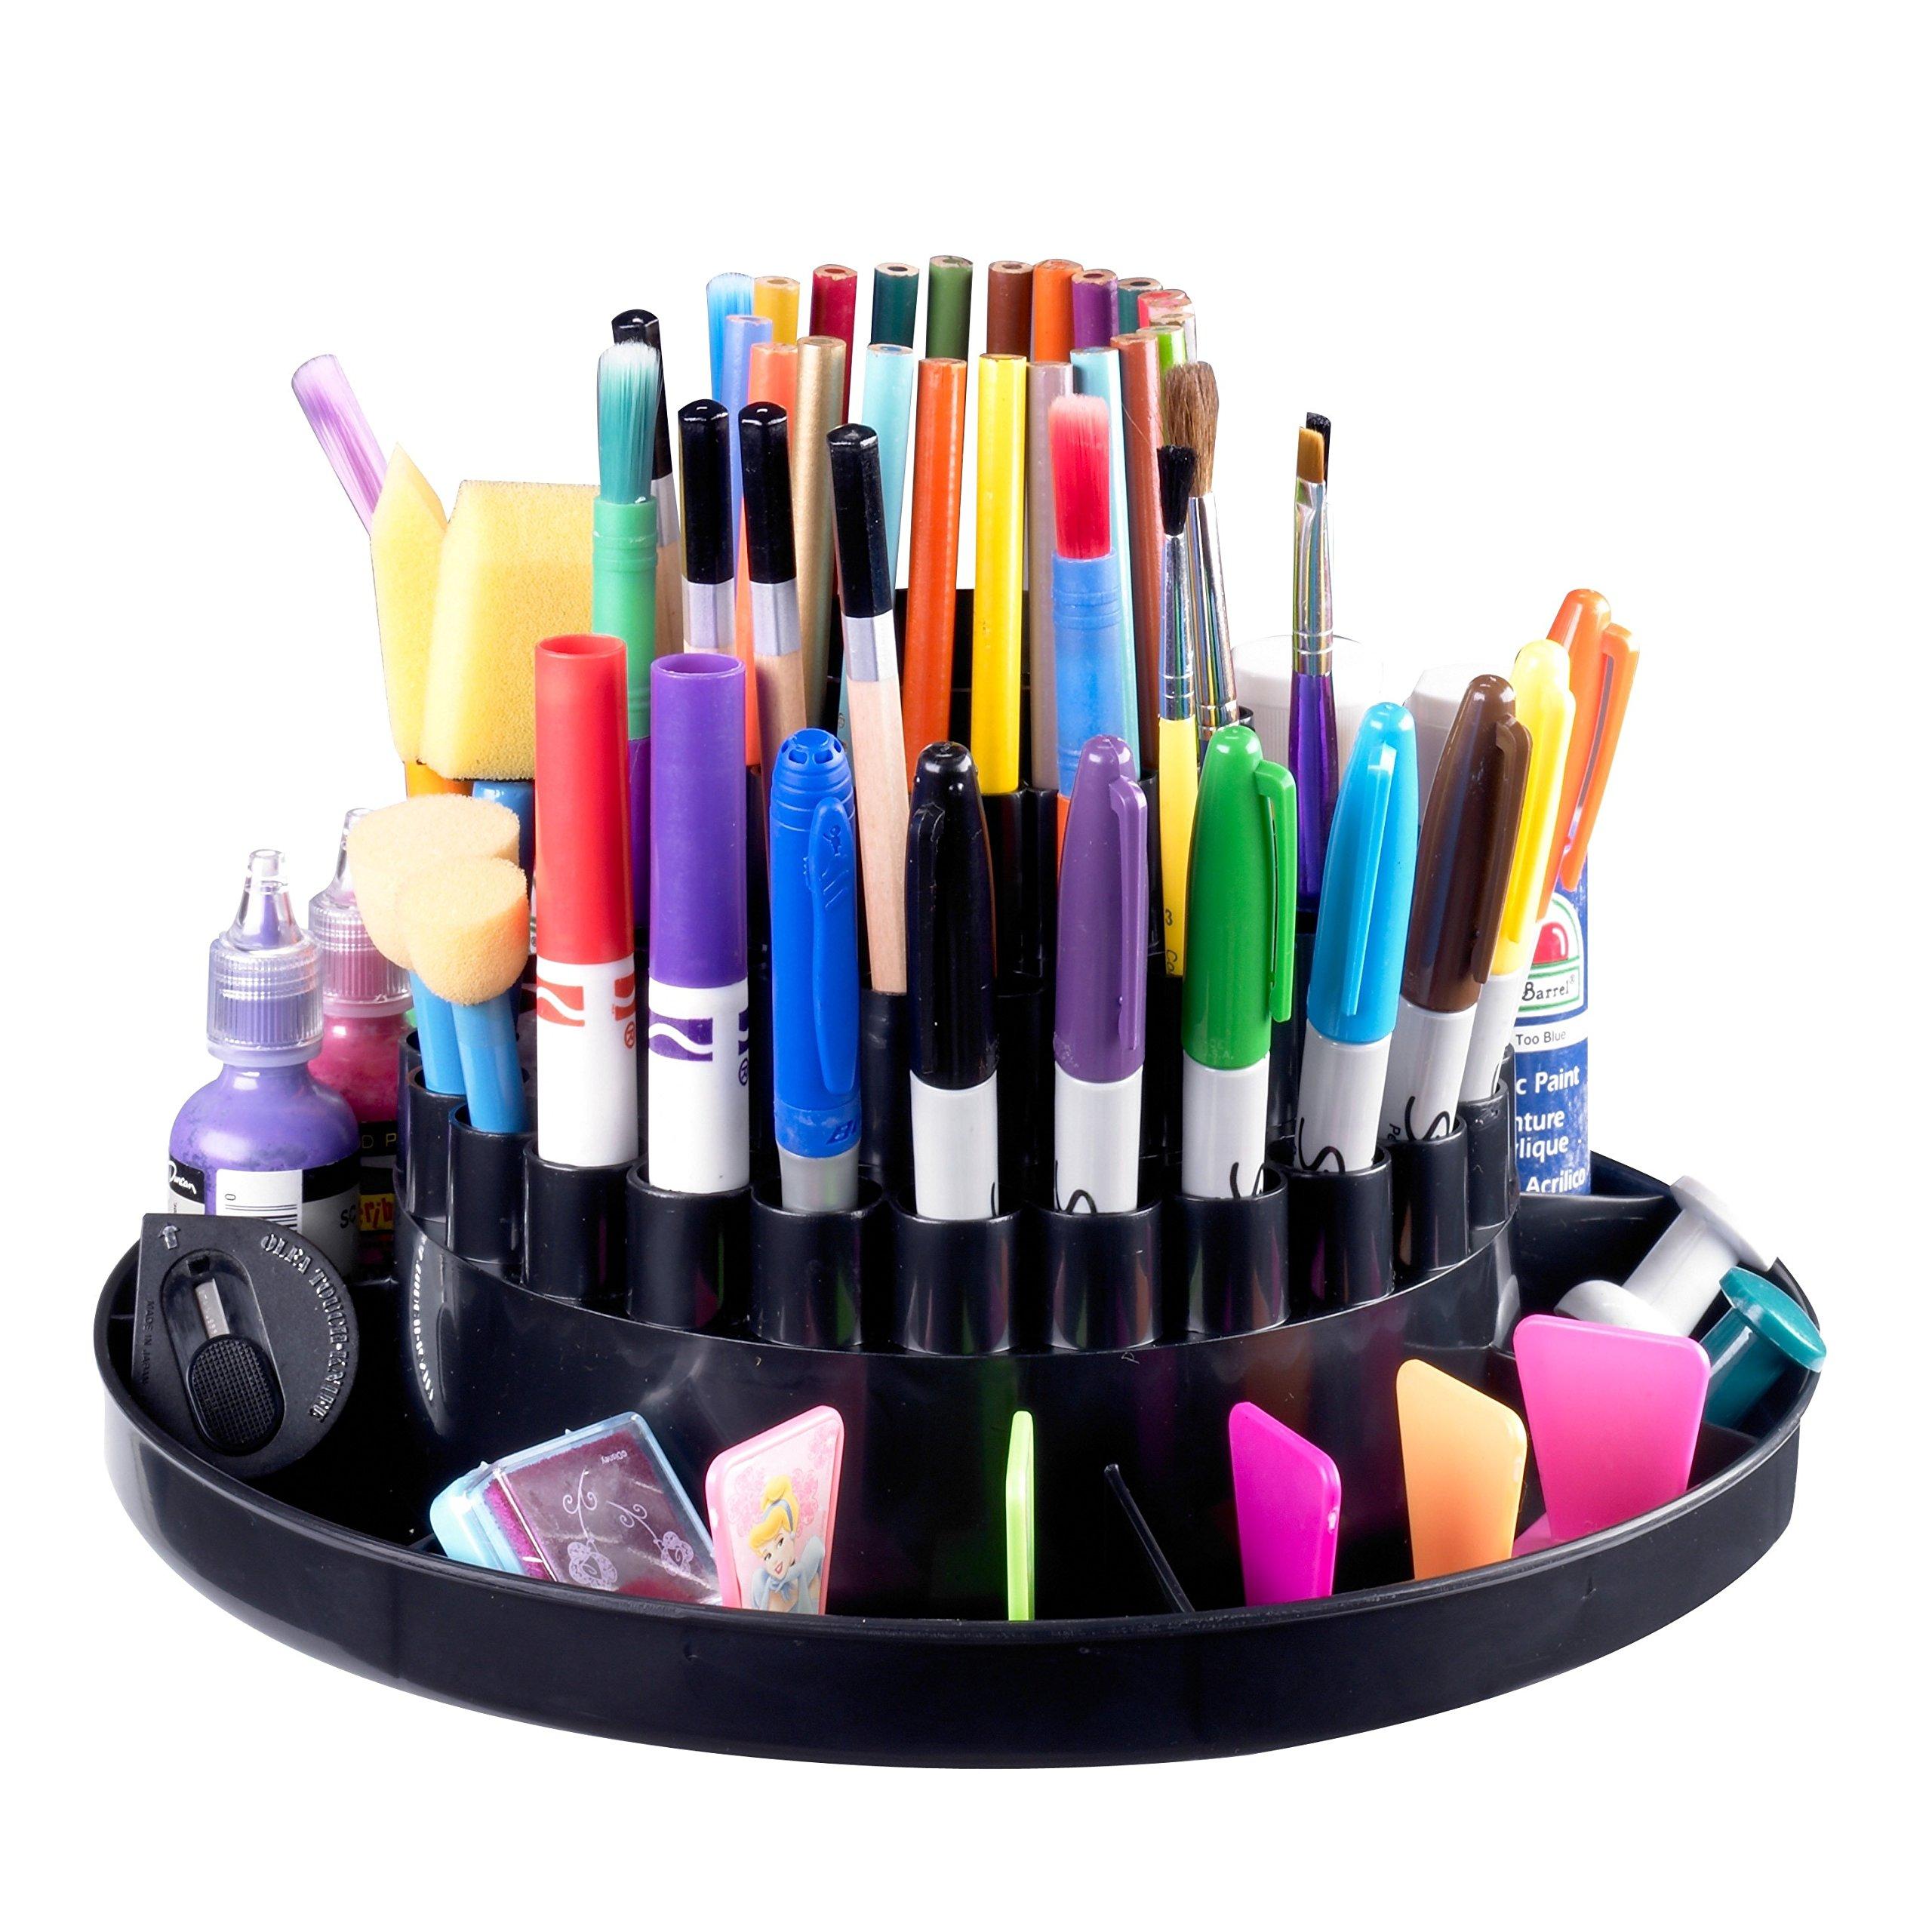 STUDIO DESIGNS INSPIRING CREATIVITY WWW.STUDIODESIGNS.COM Table Top Carousel